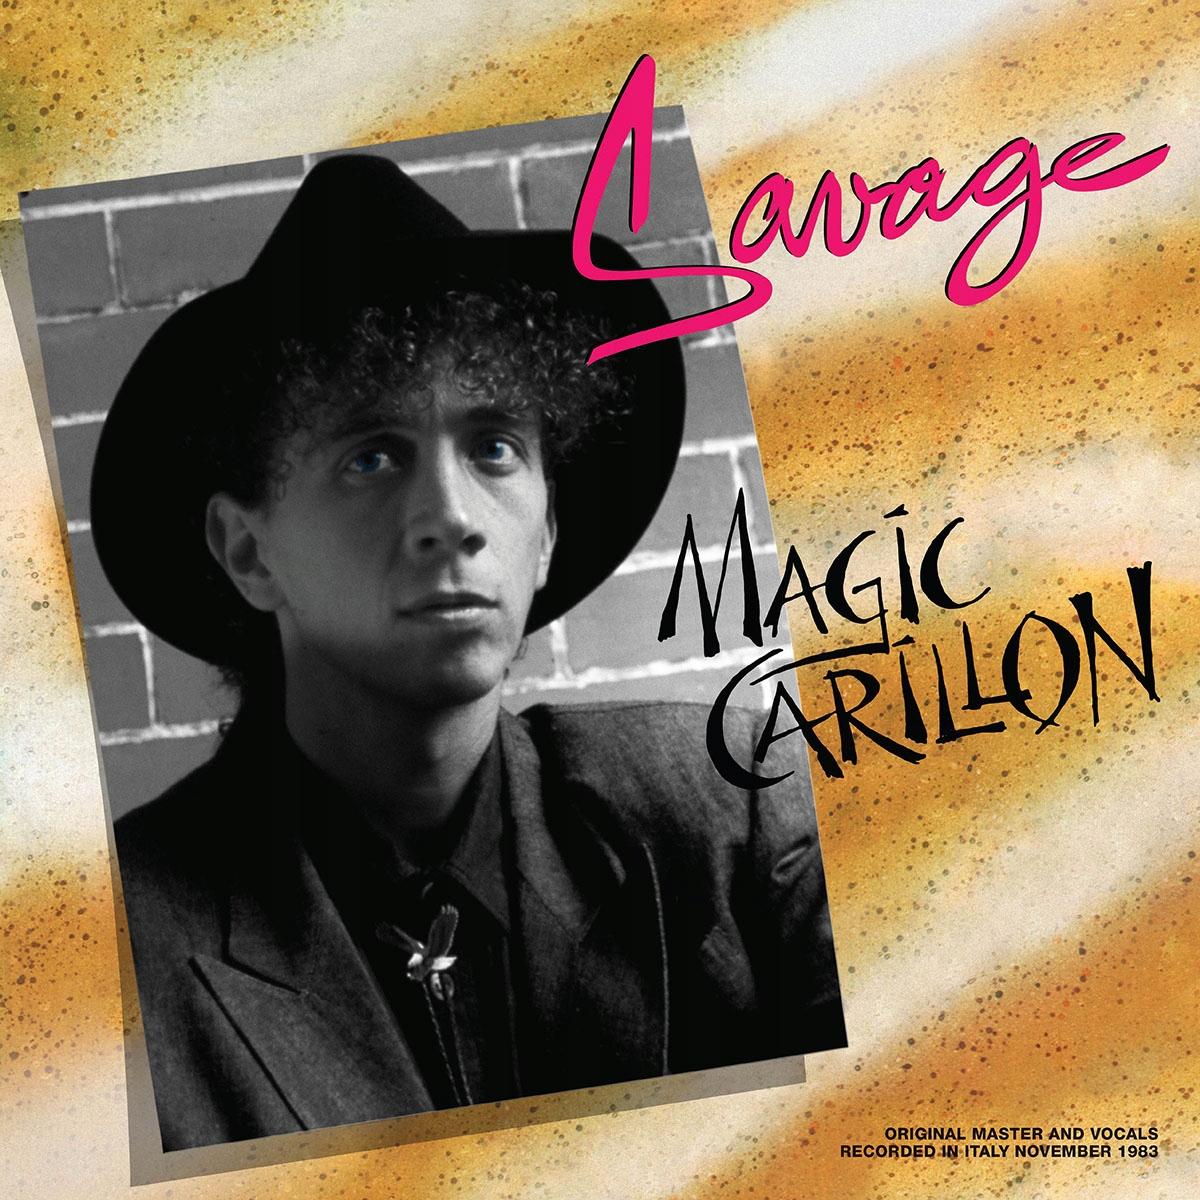 Item Savage - Magic Carillon (35th Remix) 12 MAXI White